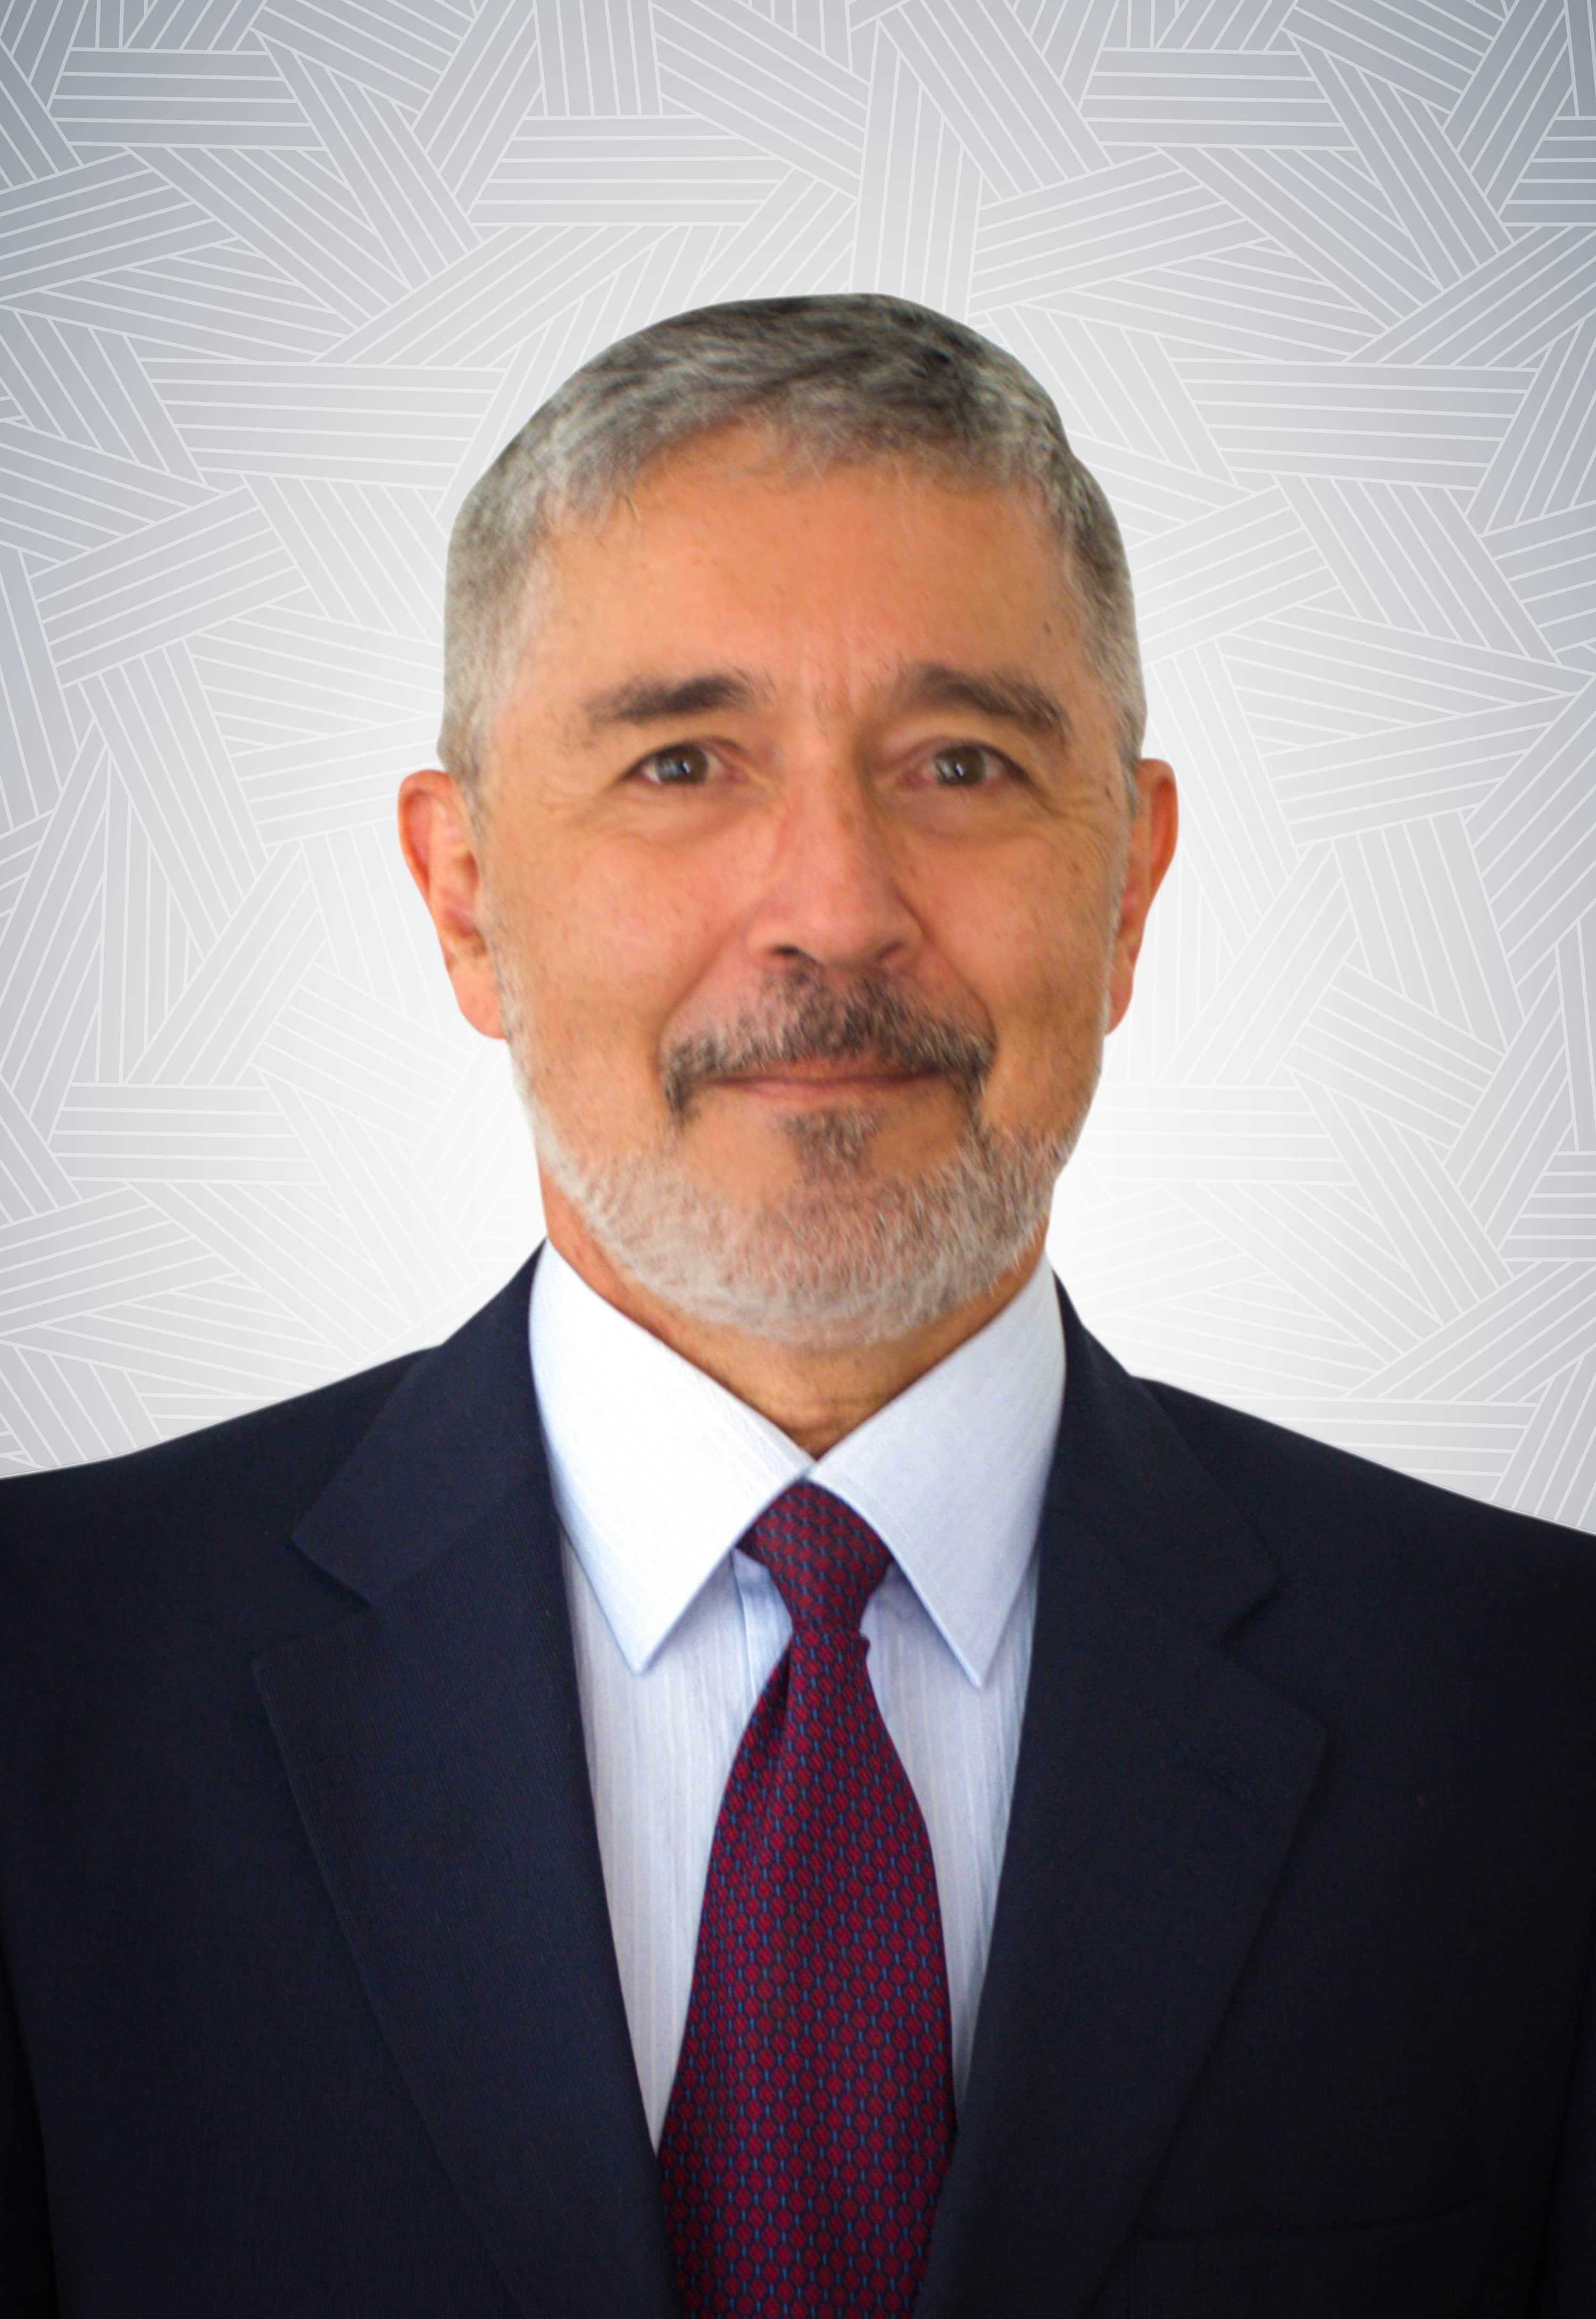 Francisco Javier Restrepo